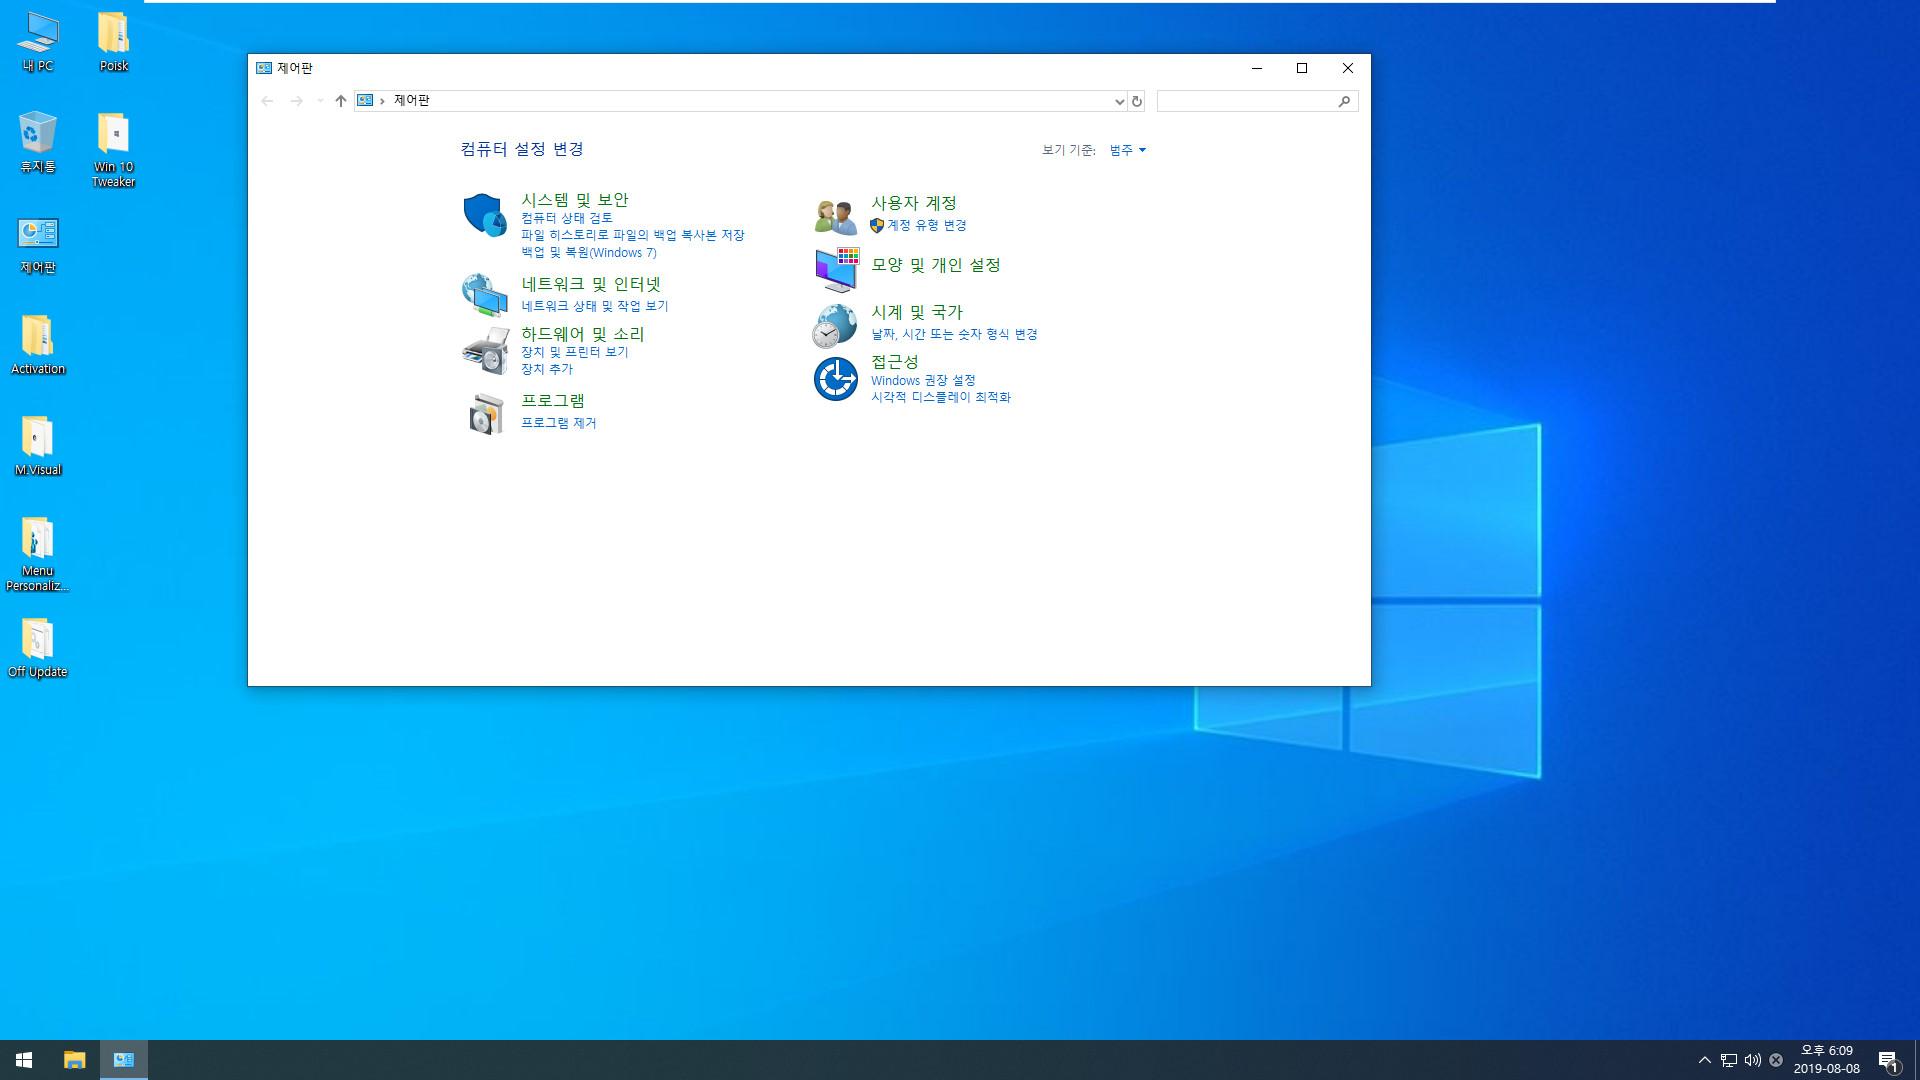 Windows 10 Enterprise x64 lite 1903 build 18362.267 by Zosma.iso - 러시아어 한글화 시도 - 그래서 그냥 원본대로 설치 후에 한글화 시도 2019-08-09_000948.jpg